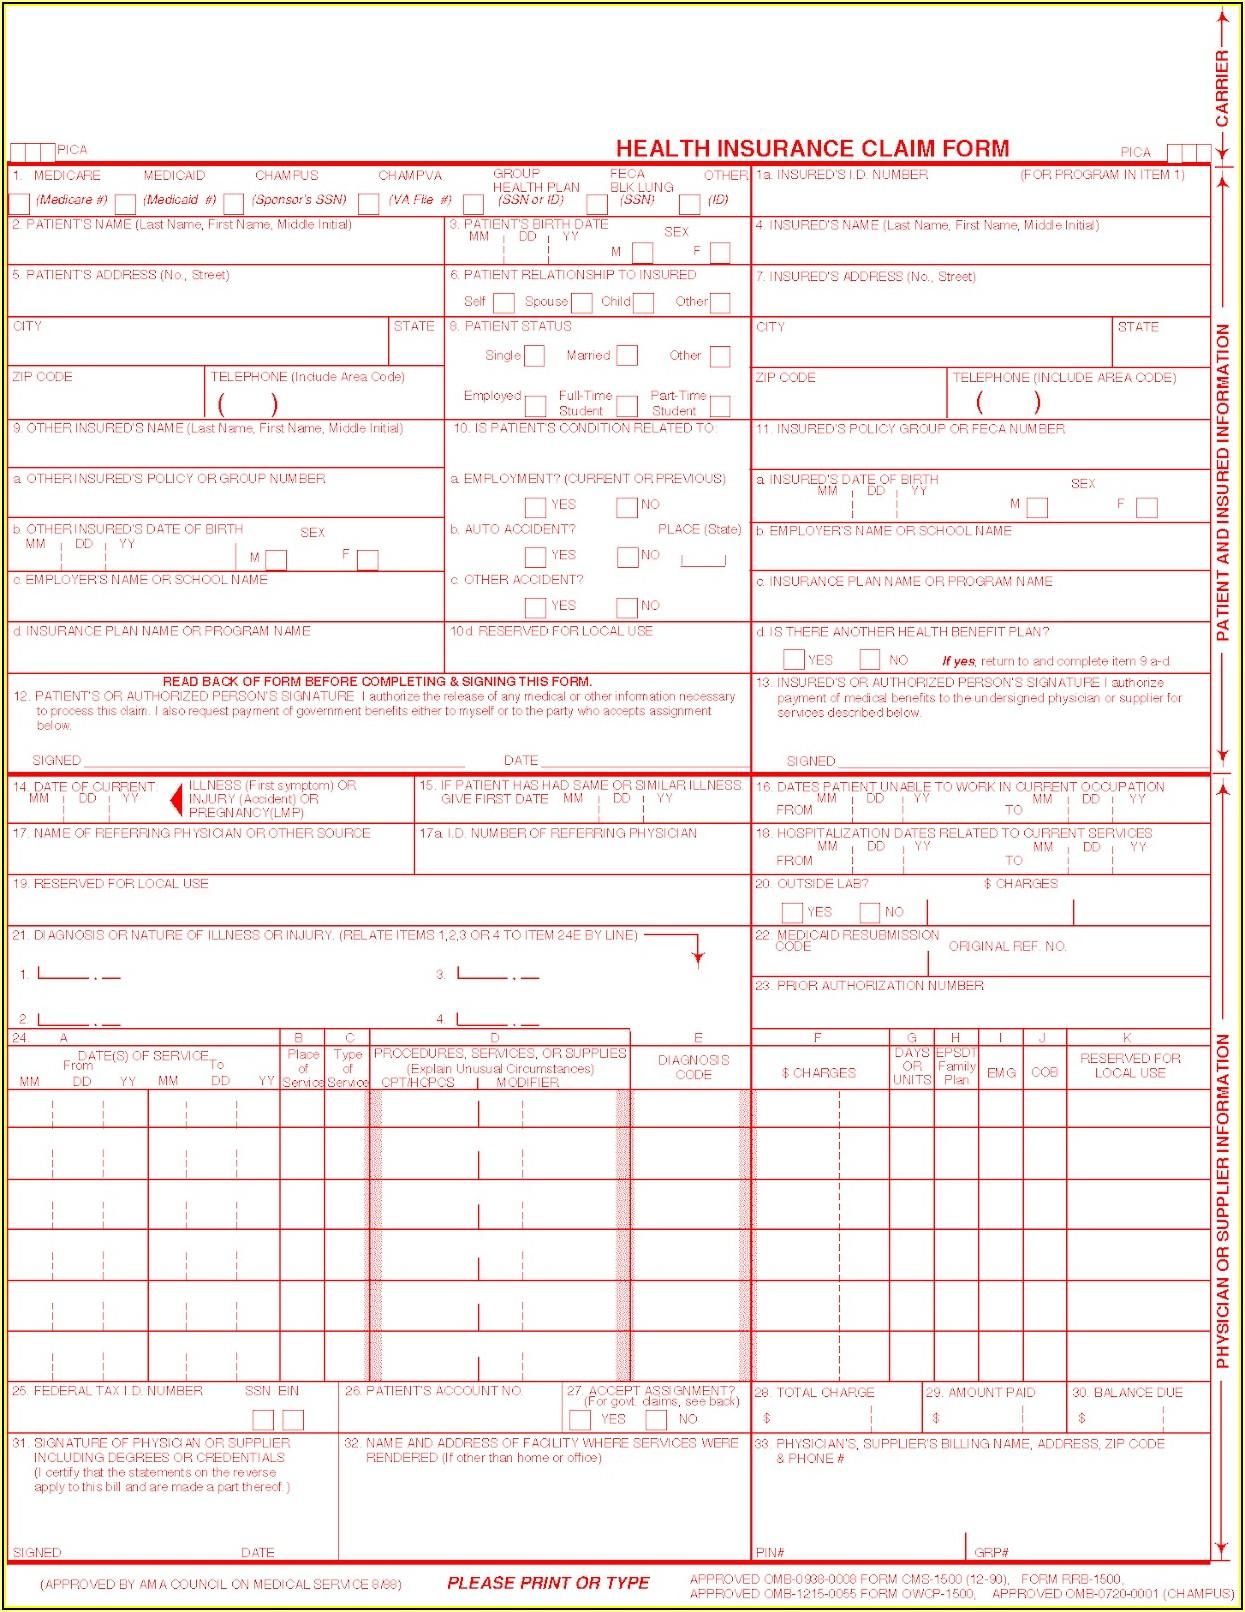 Free Fillable Cms 1500 Form Pdf